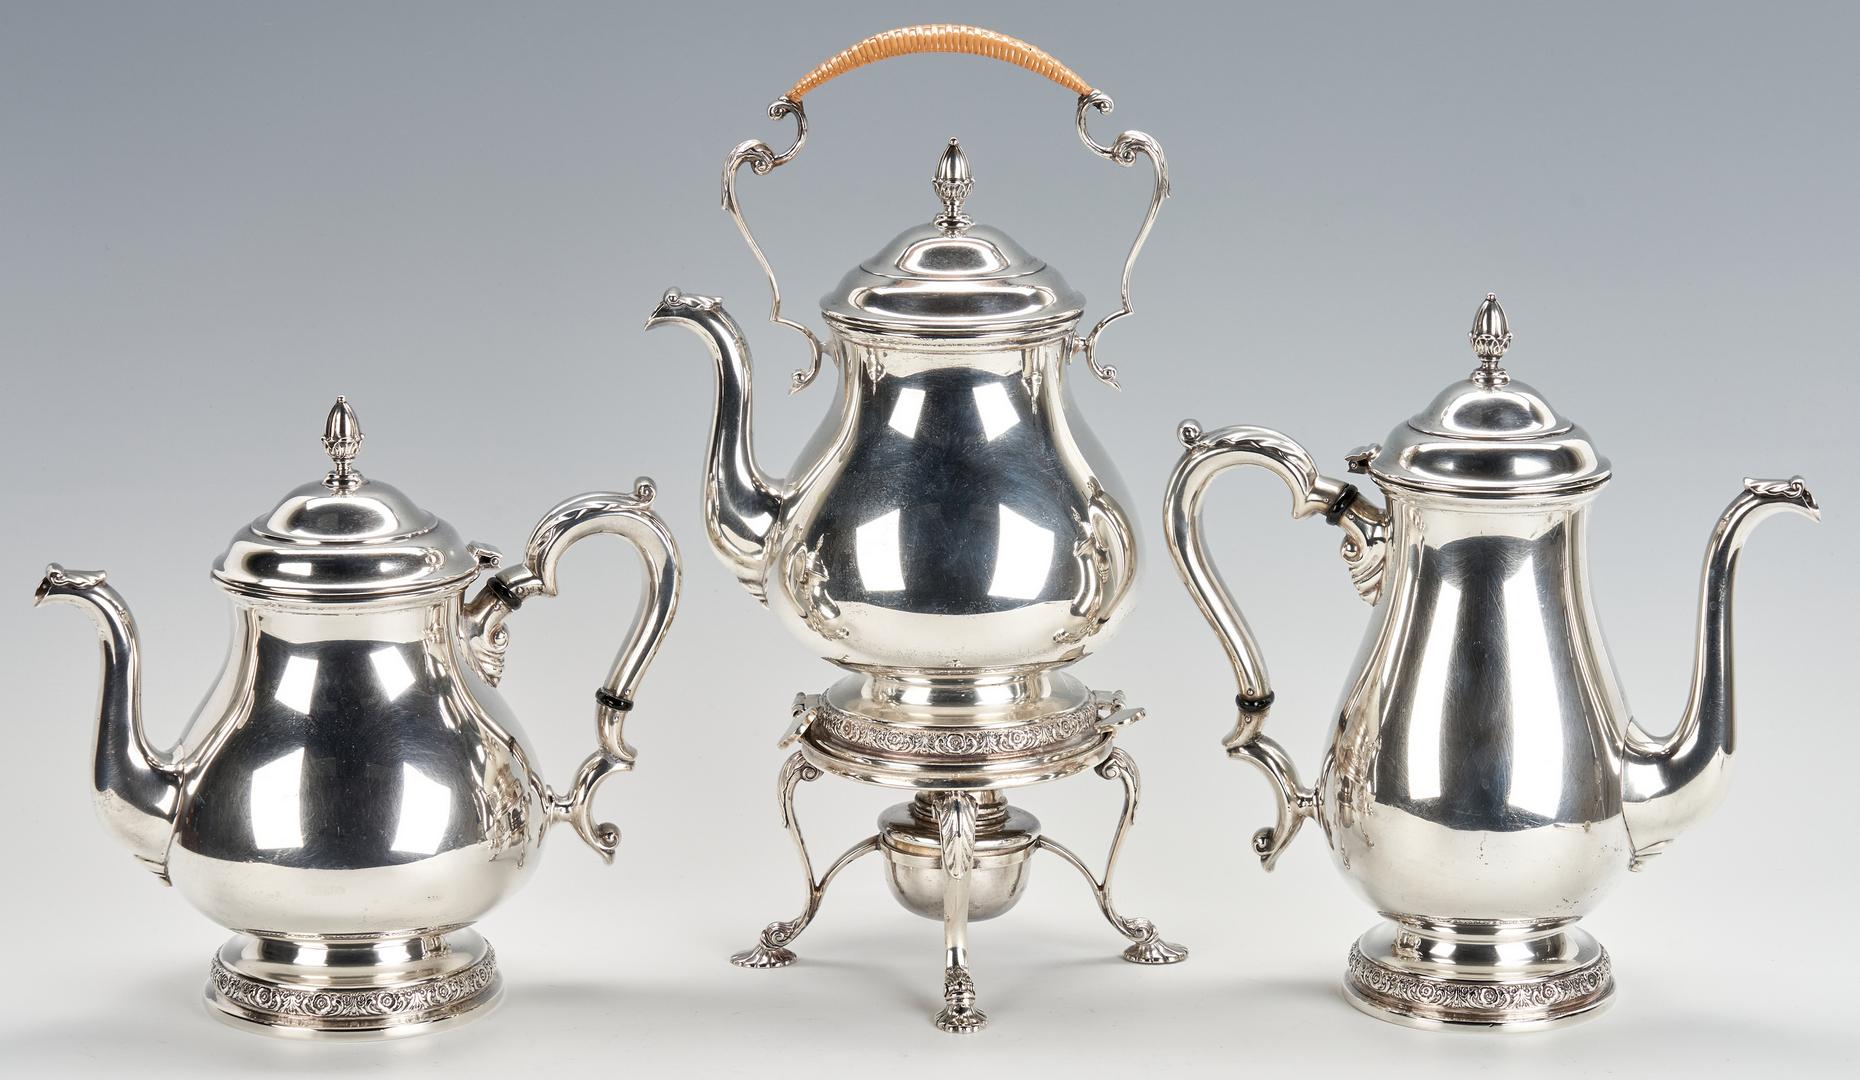 Lot 236: International Prelude Sterling Silver Tea Service, S. Kirk Snuffer